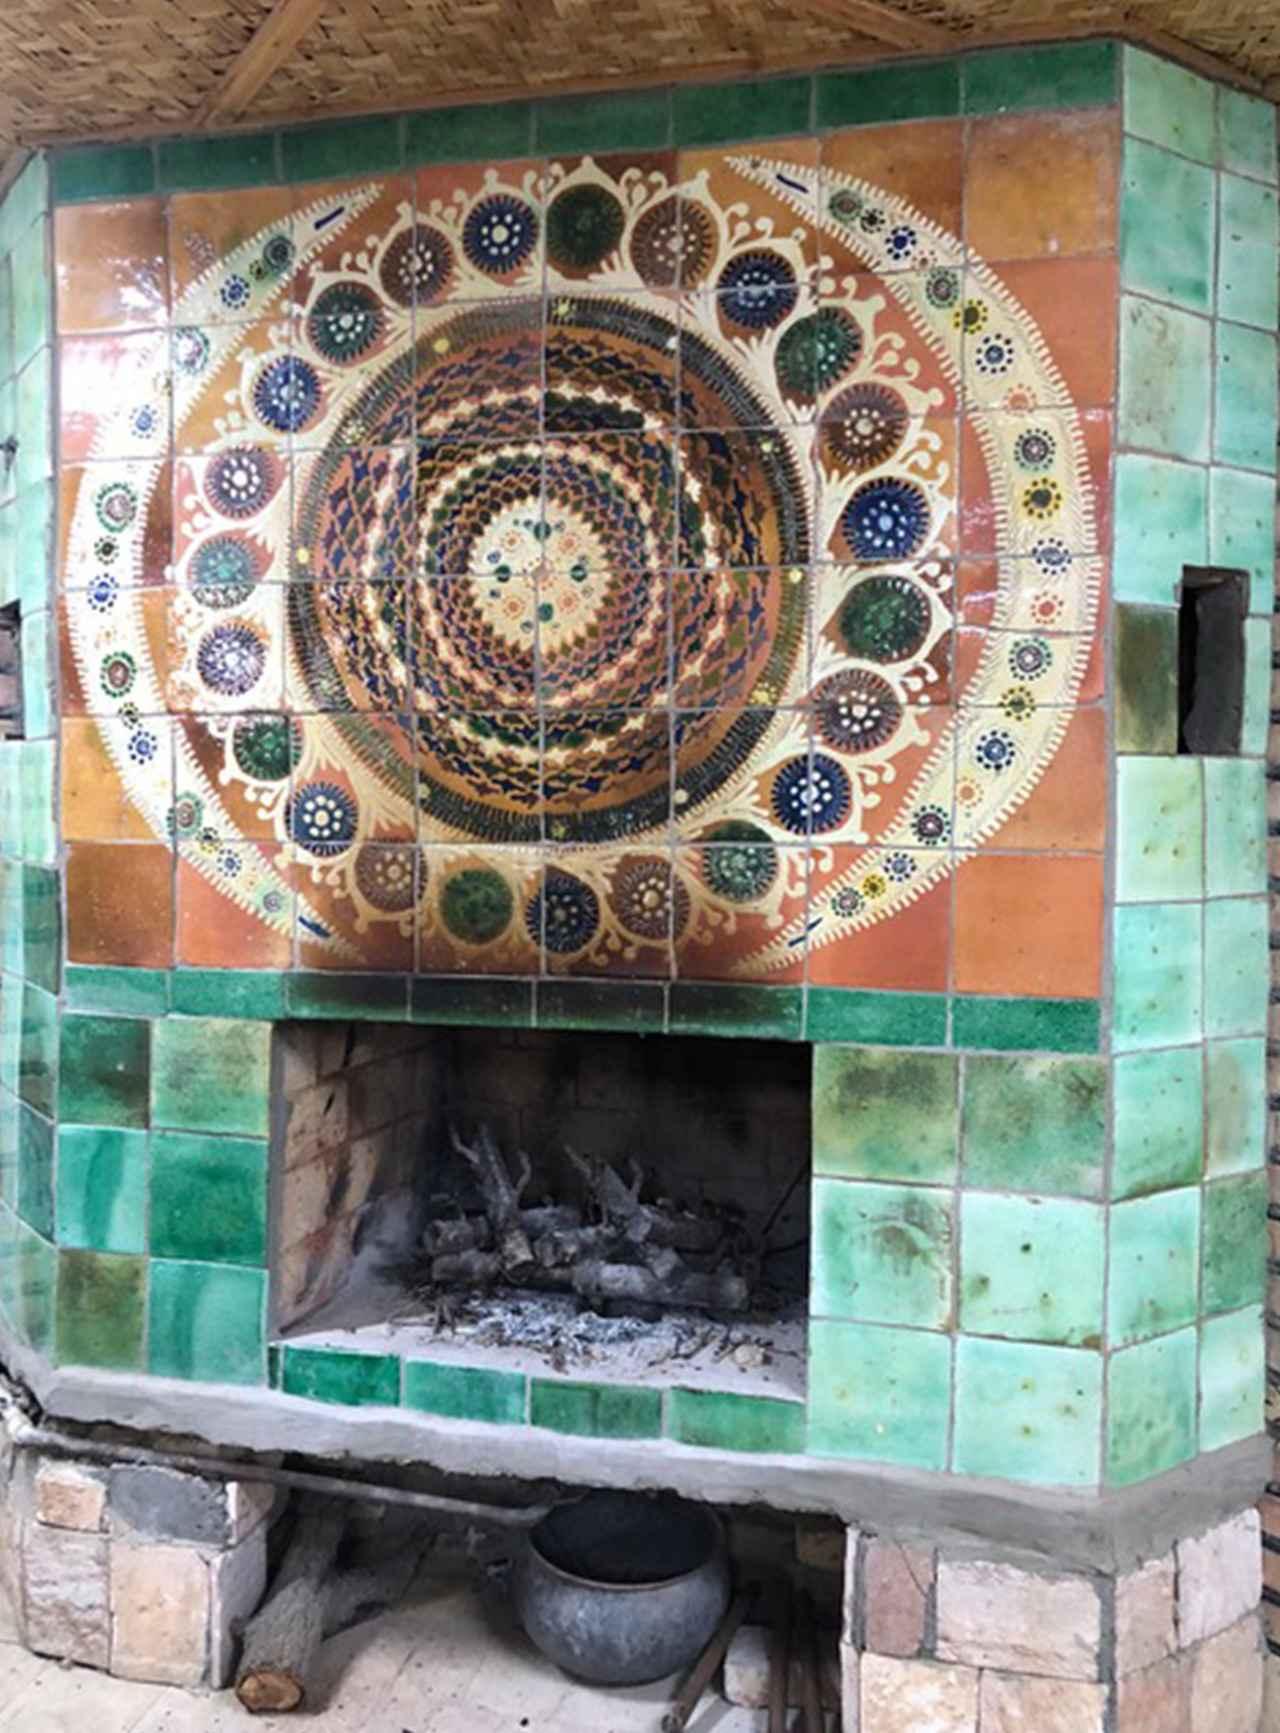 Images : 工房内にある暖炉